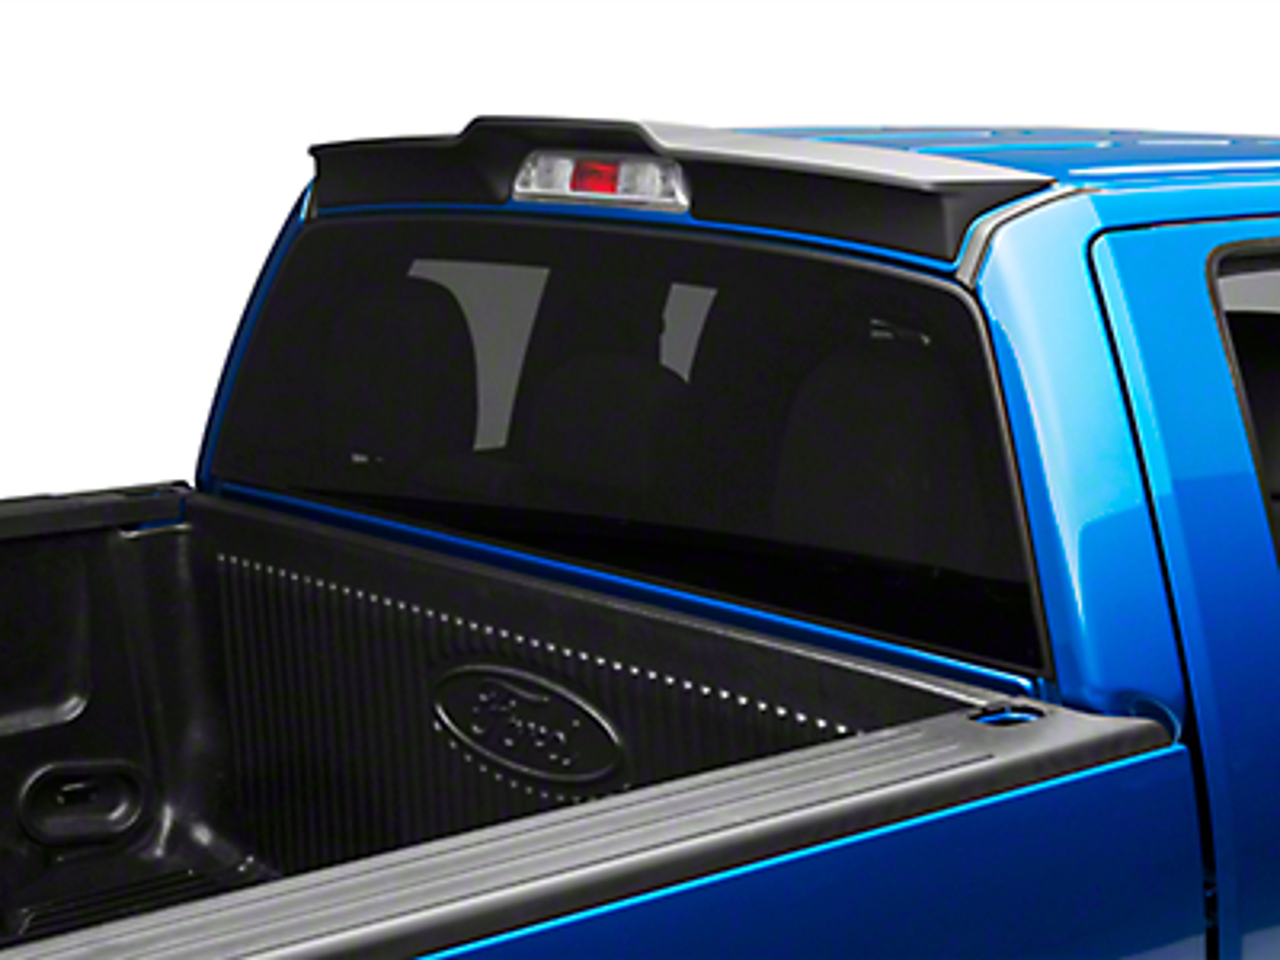 MMD Pre-Painted Rear Truck Cab Spoiler - Matte Black (09-14 F-150)